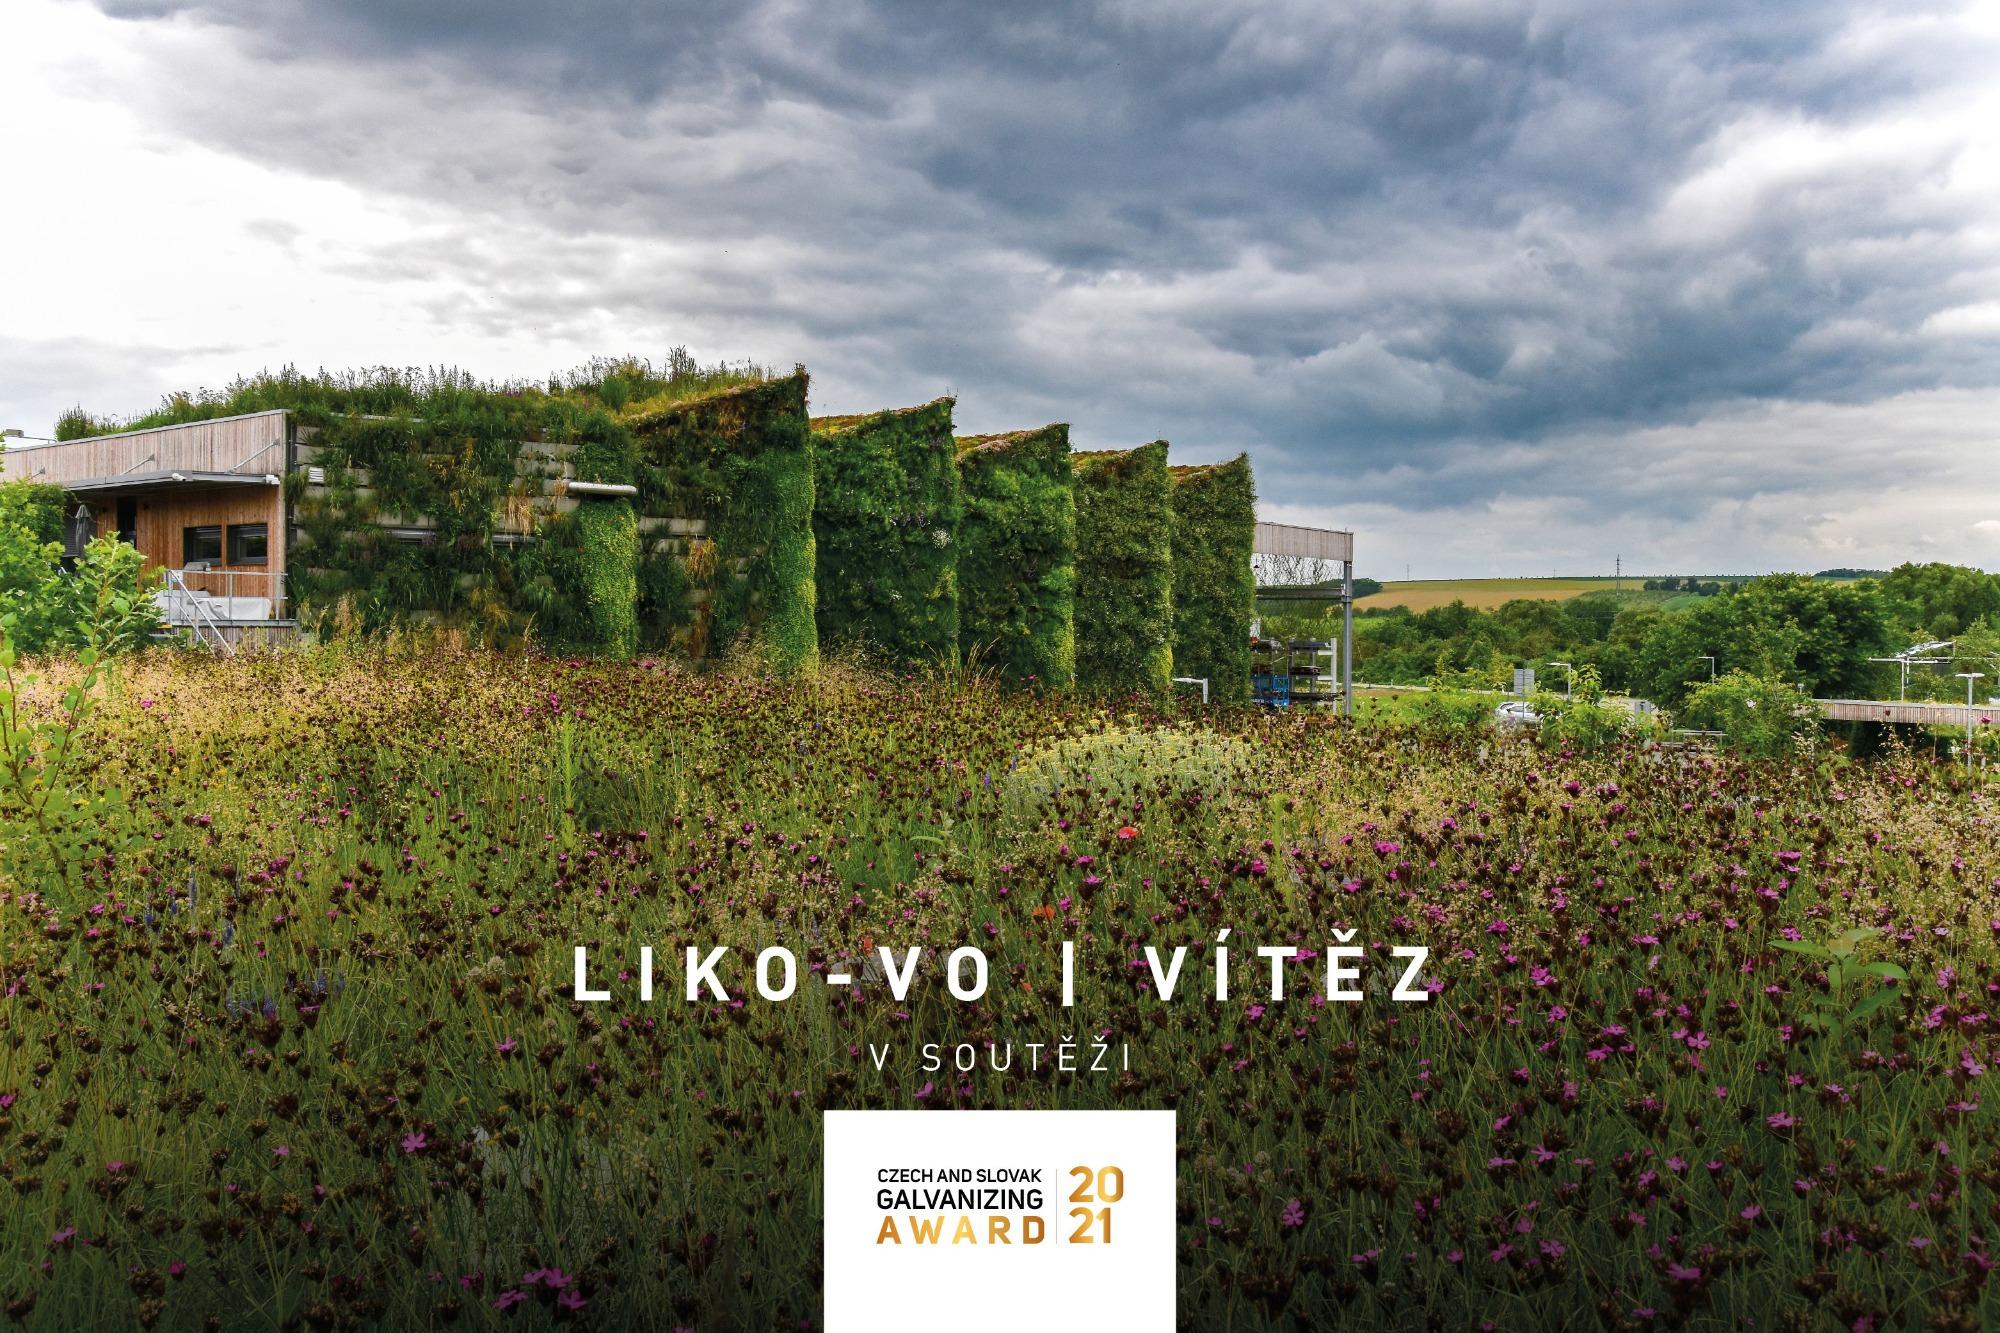 Grünhalle LIKO-V gewinnt den Czech and Slovak Galvanizing Award 2021